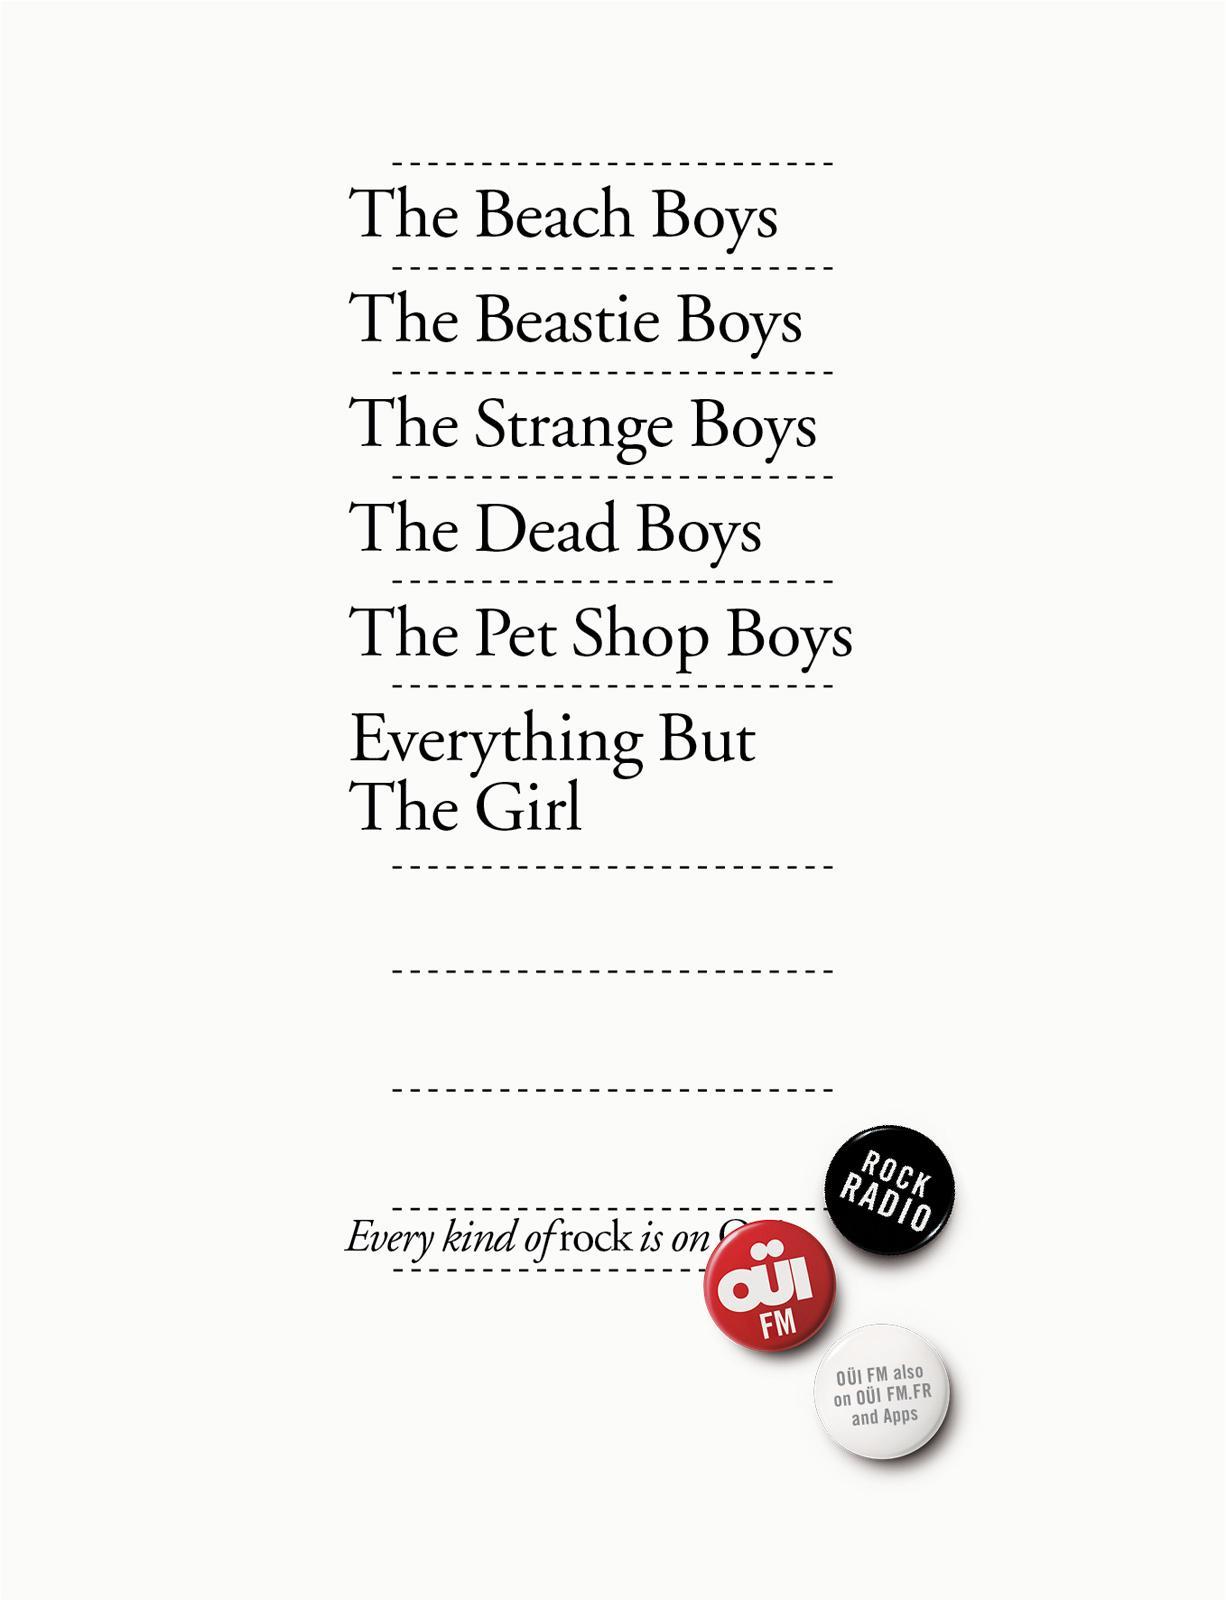 Oui FM Print Ad -  Every kind of rock, 5